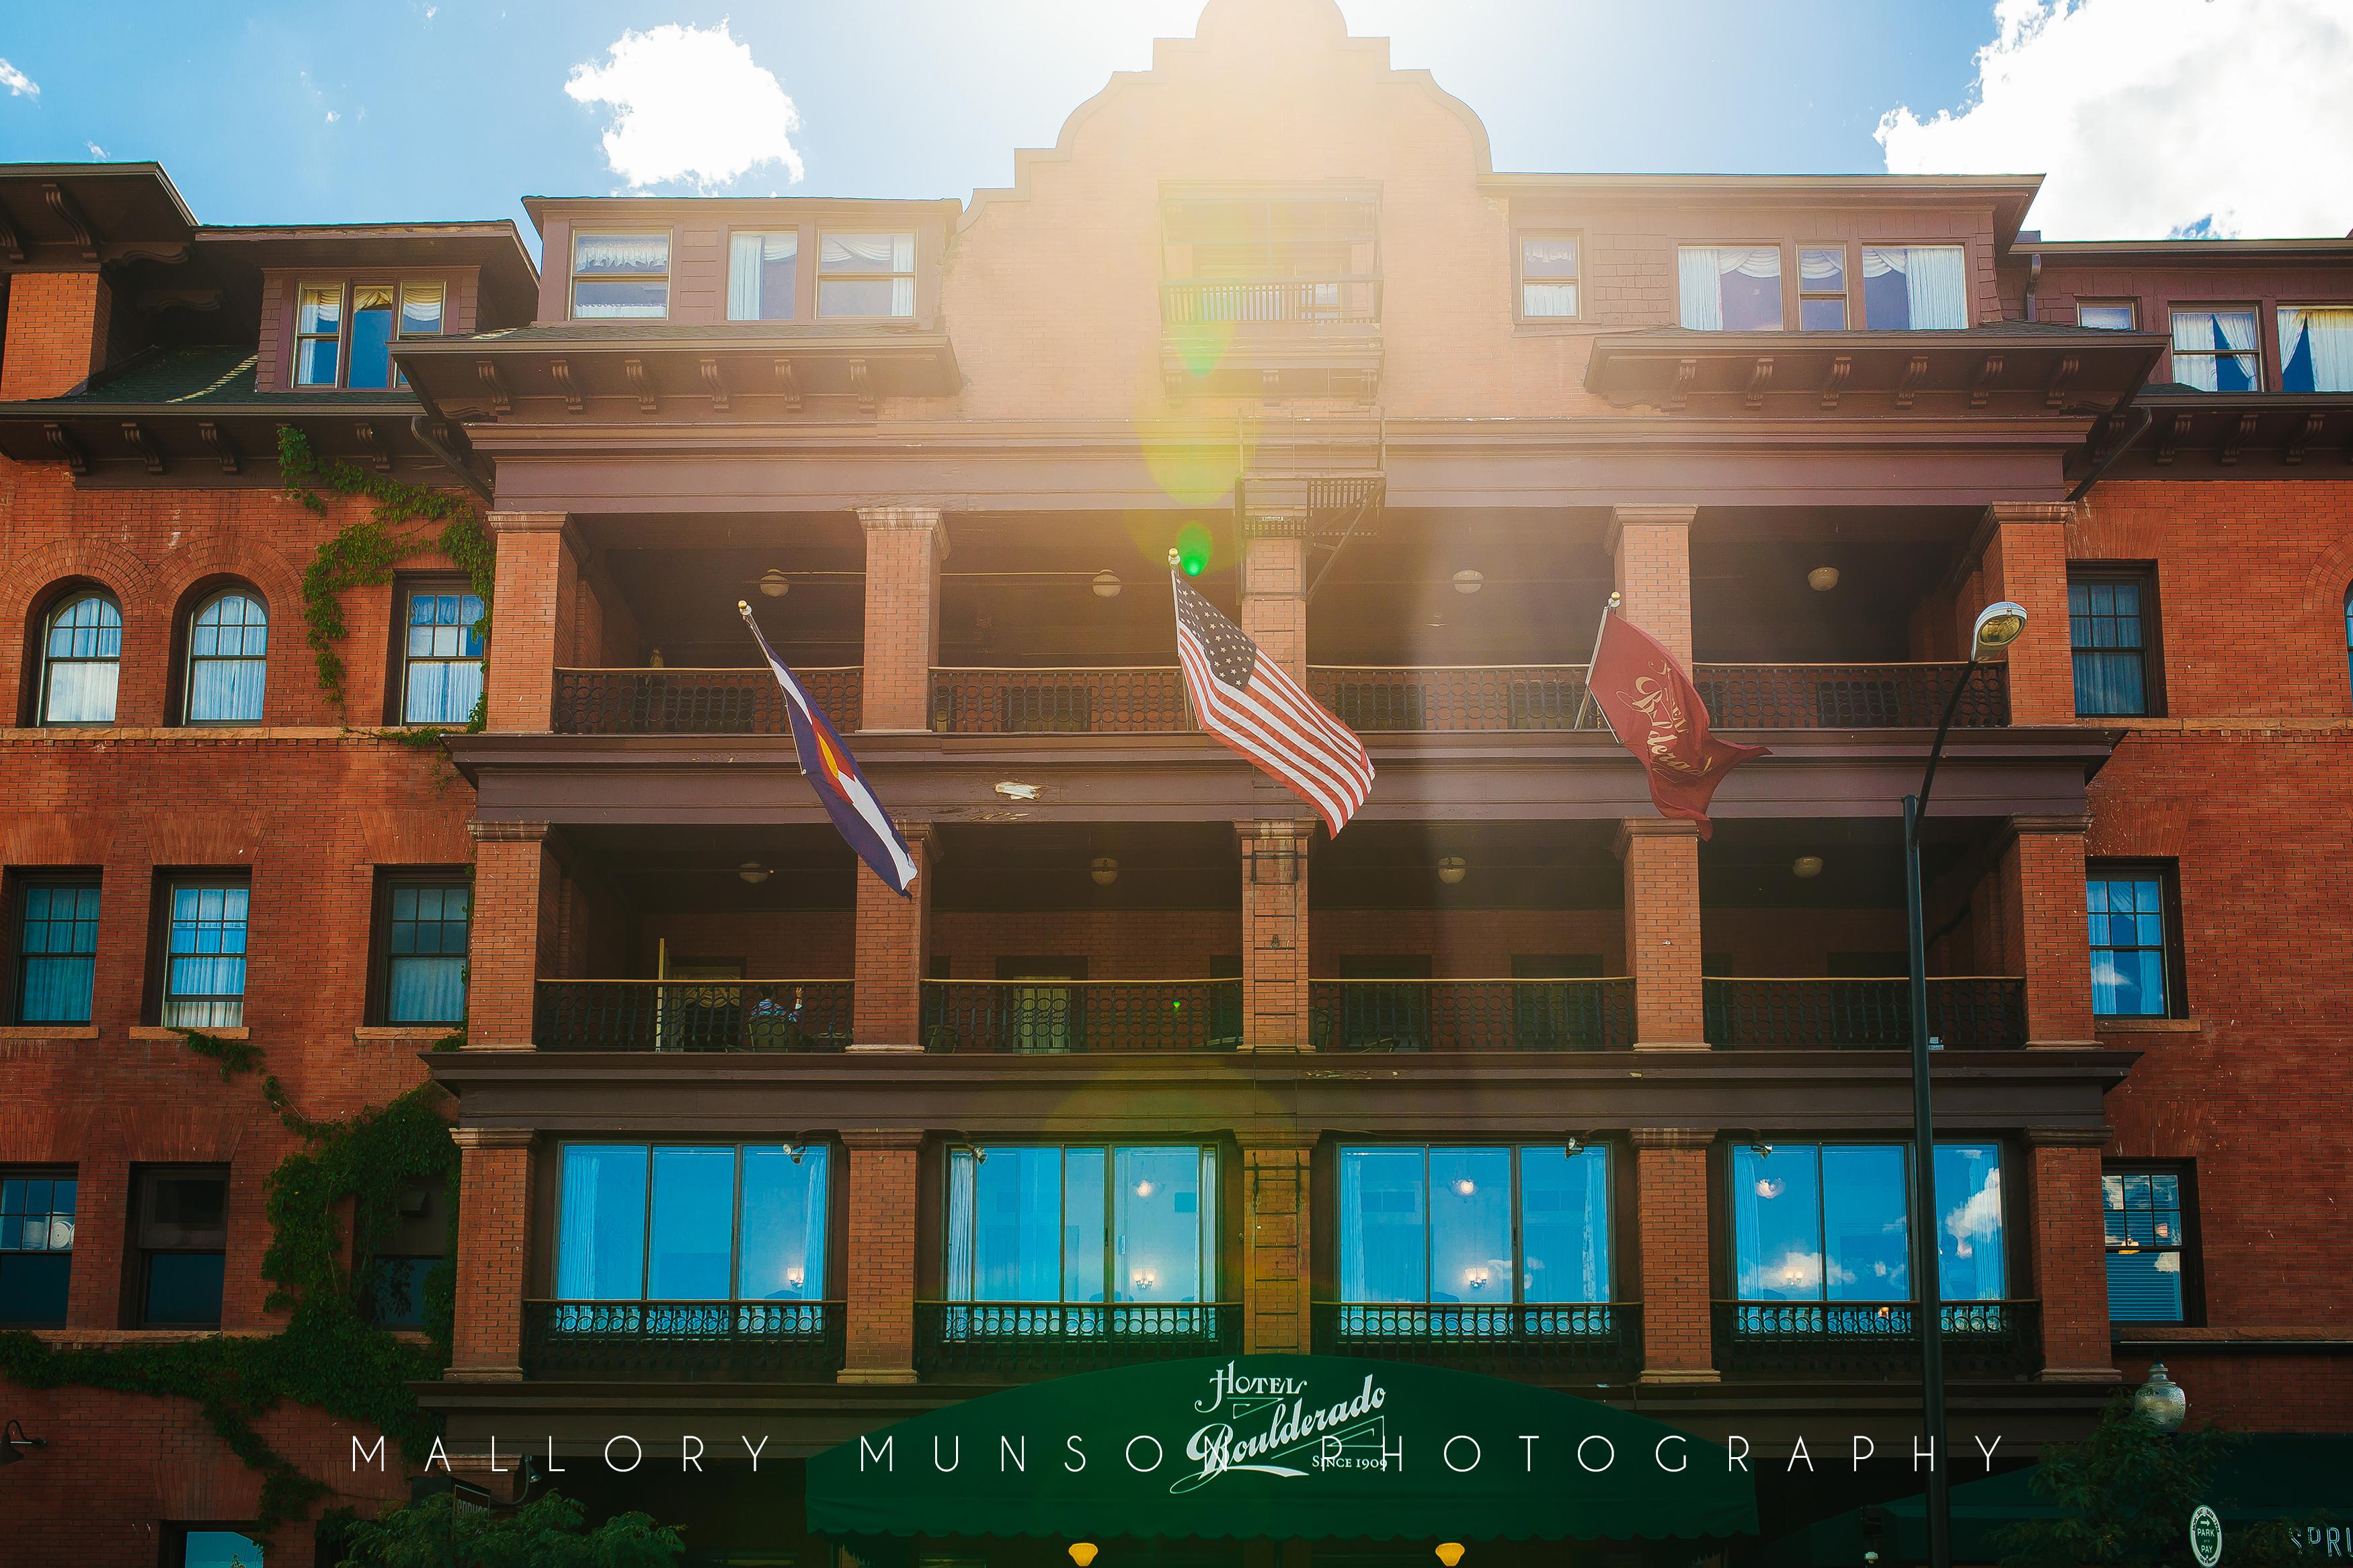 mallory_munson_photography-hotel_boulderado-30